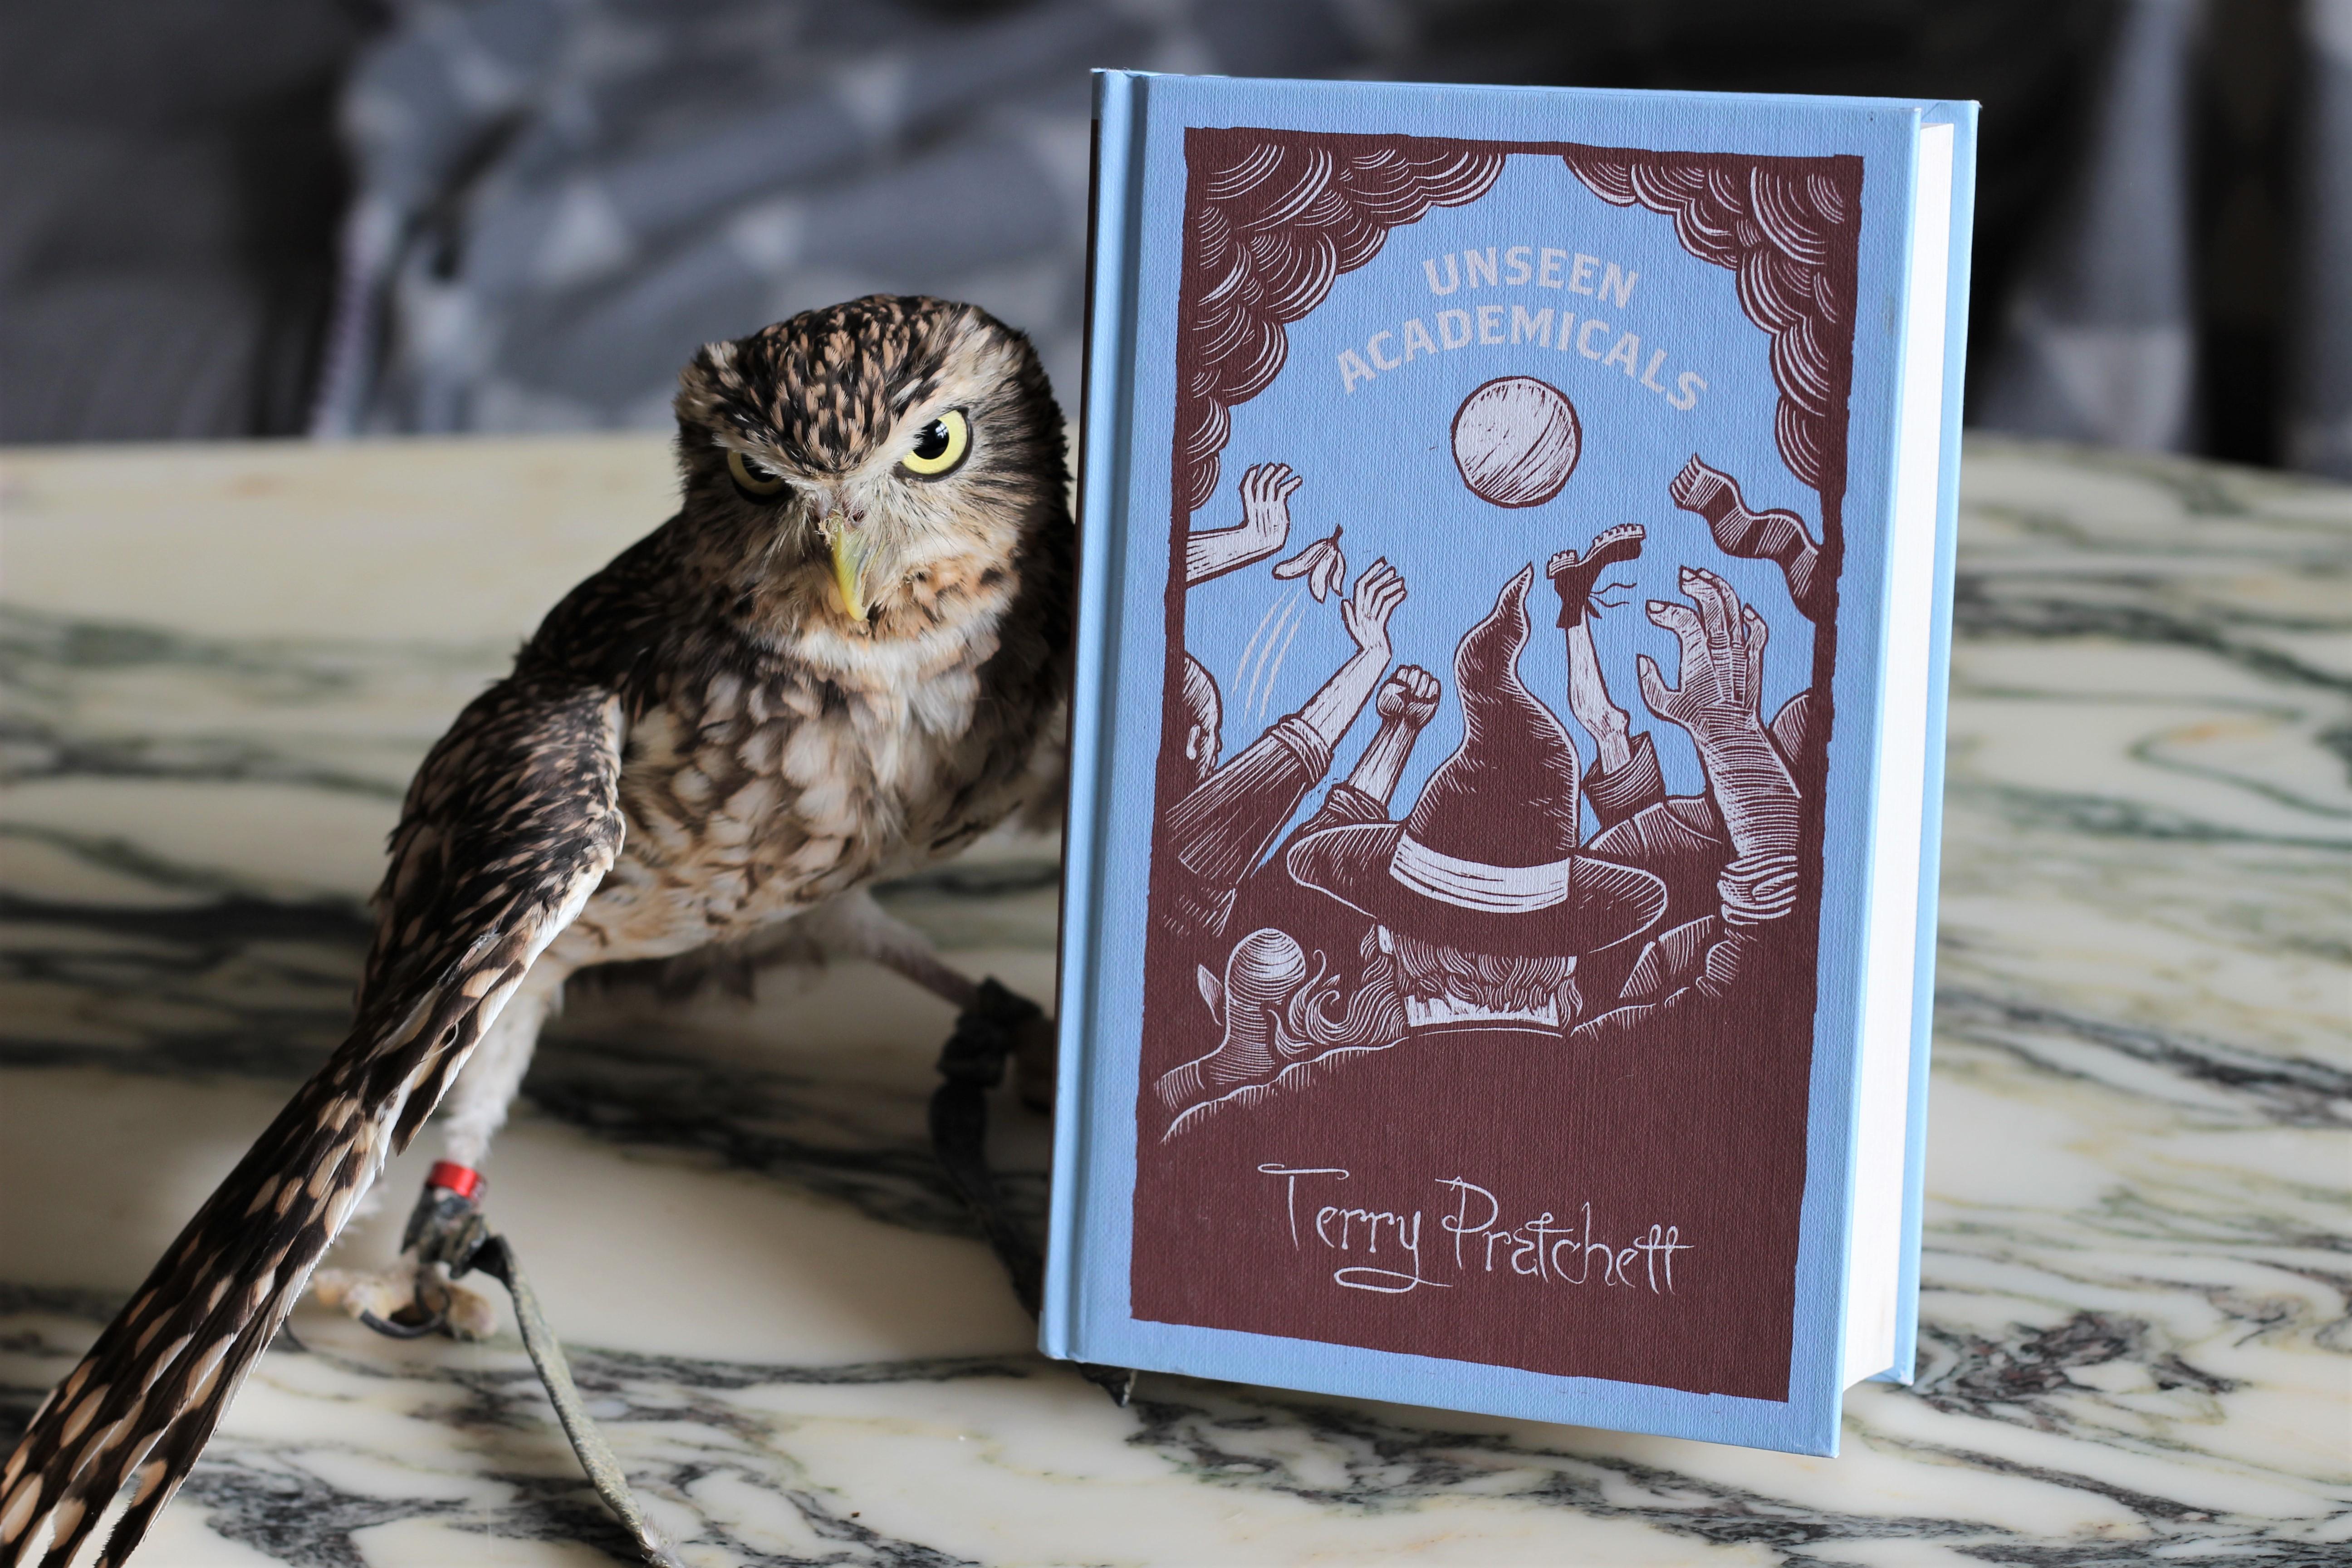 Unseen Academicals Terry Pratchett